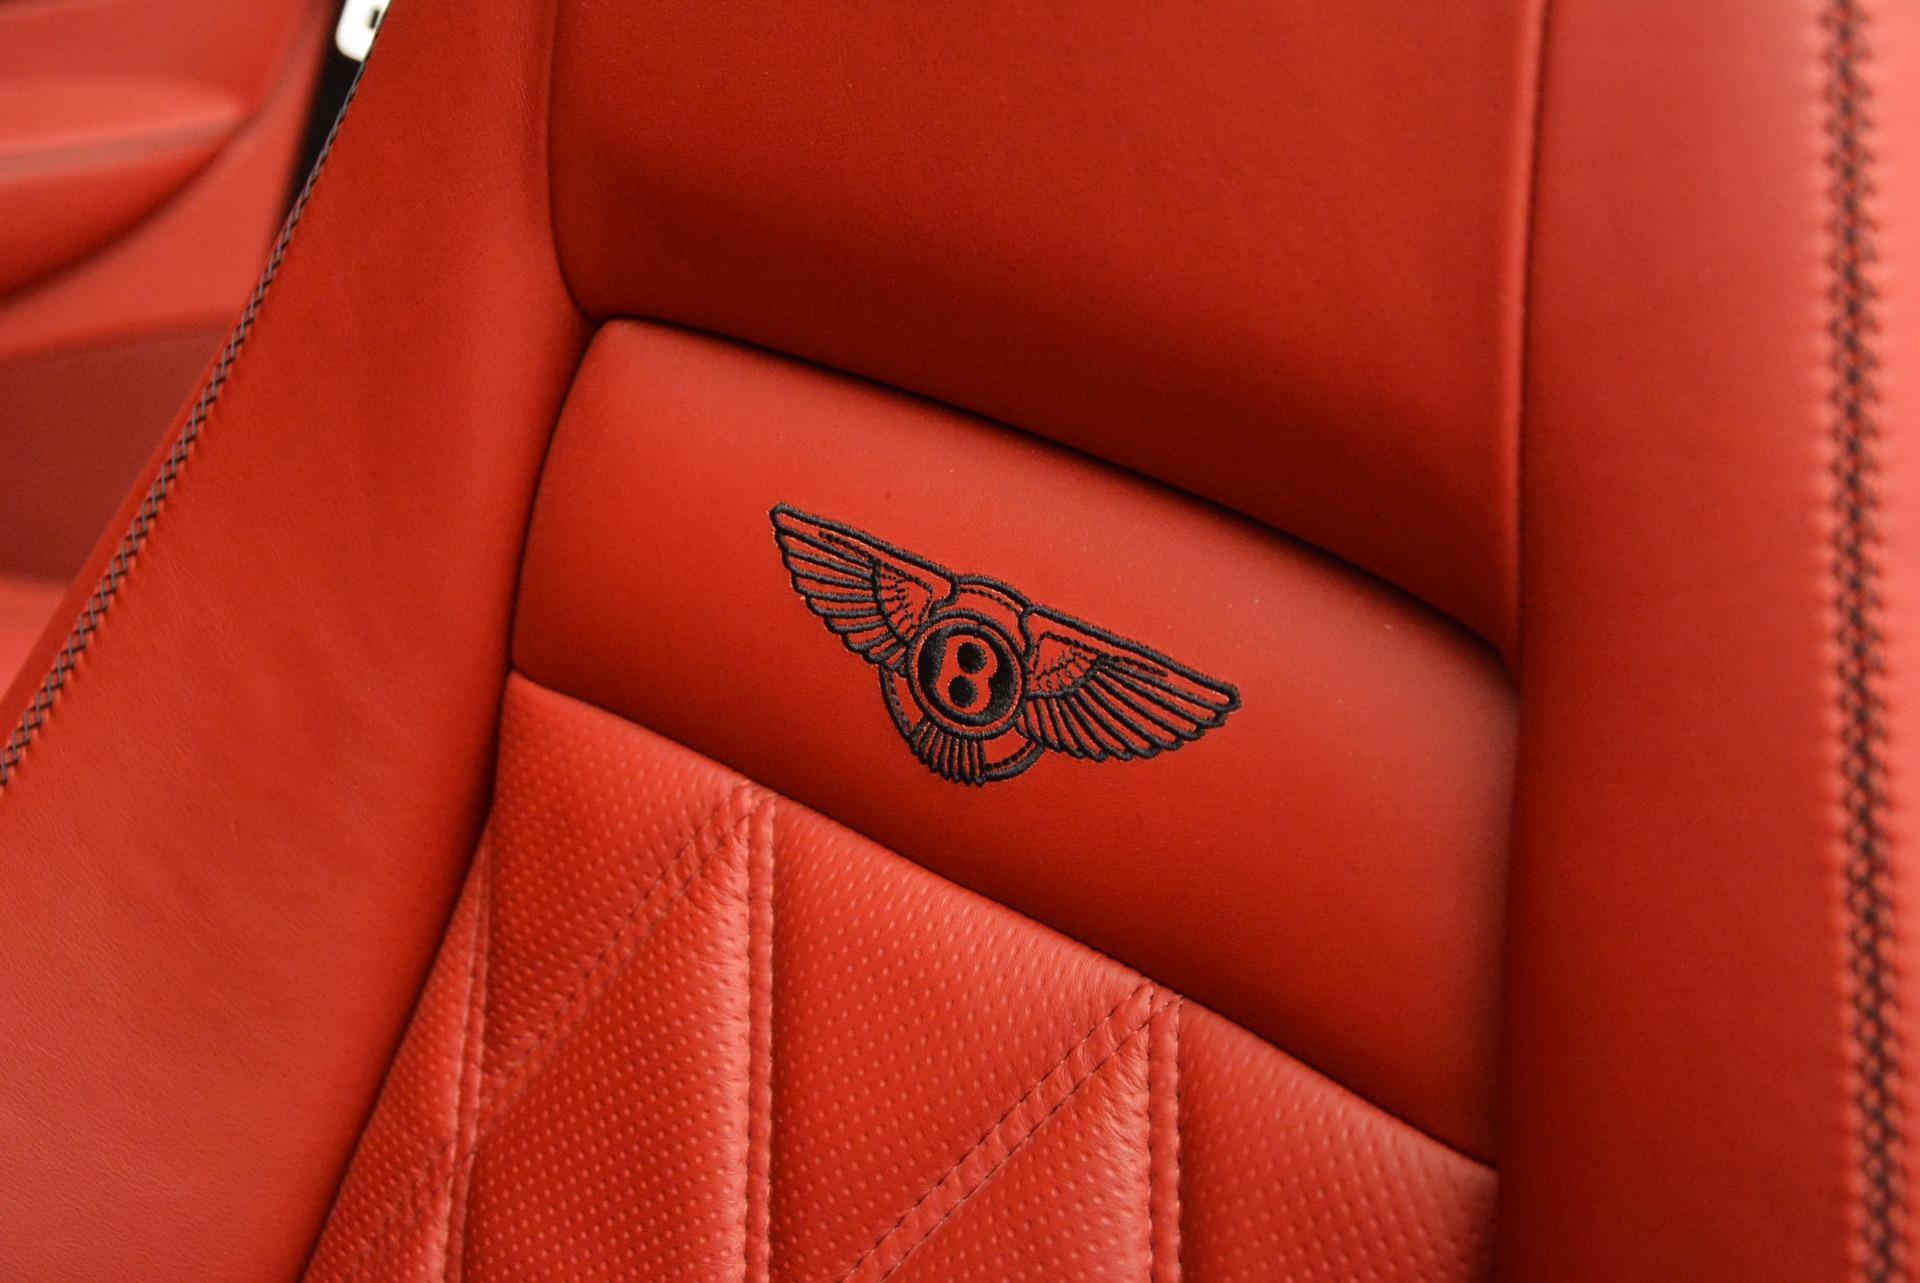 Used 2010 Bentley Continental GT Speed For Sale In Westport, CT 1298_p36